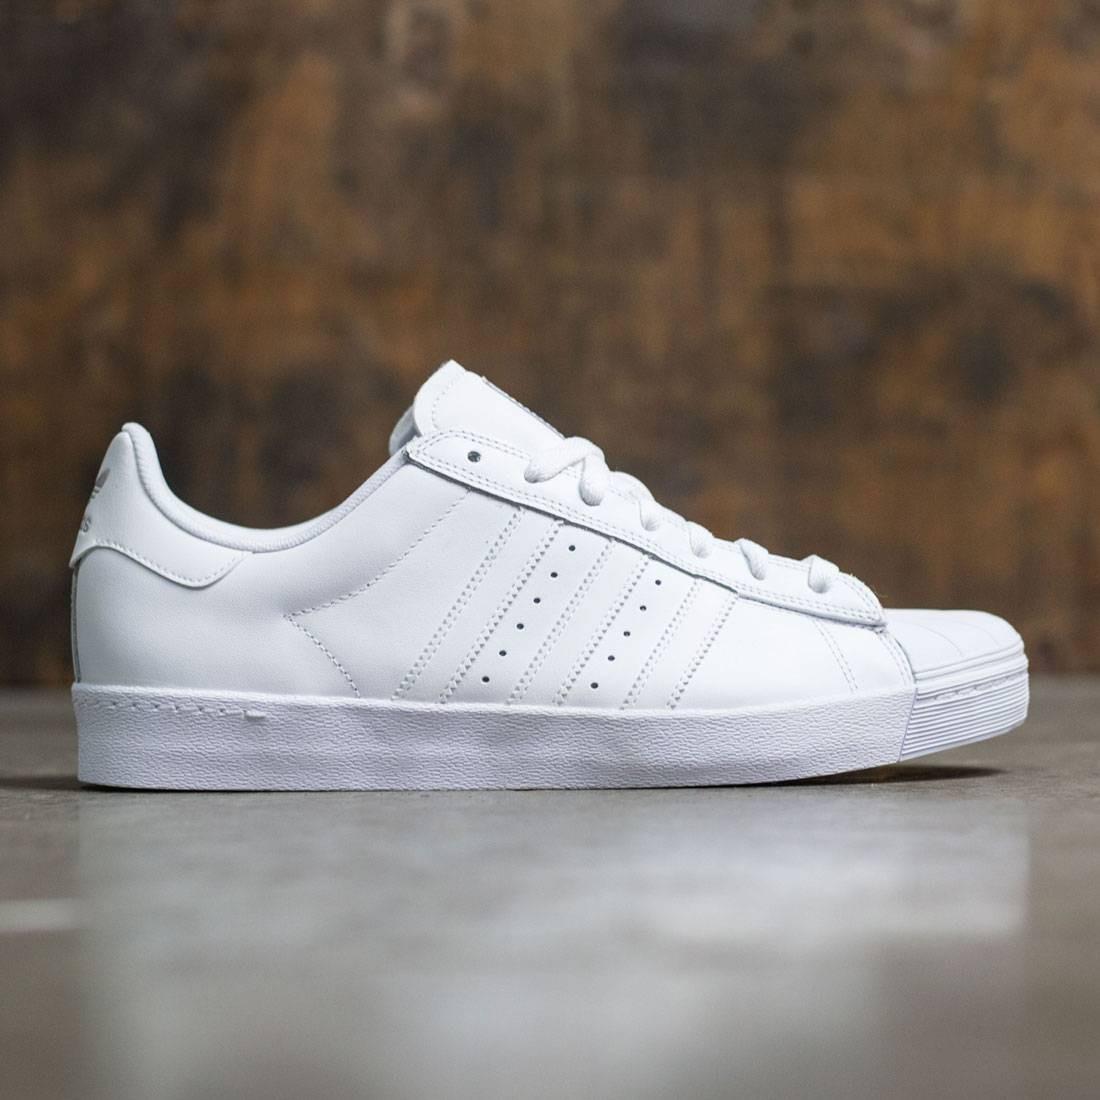 best service 765ed a89cf Cheap Adidas Originals Superstar leather sneakers NET A PORTER.COM